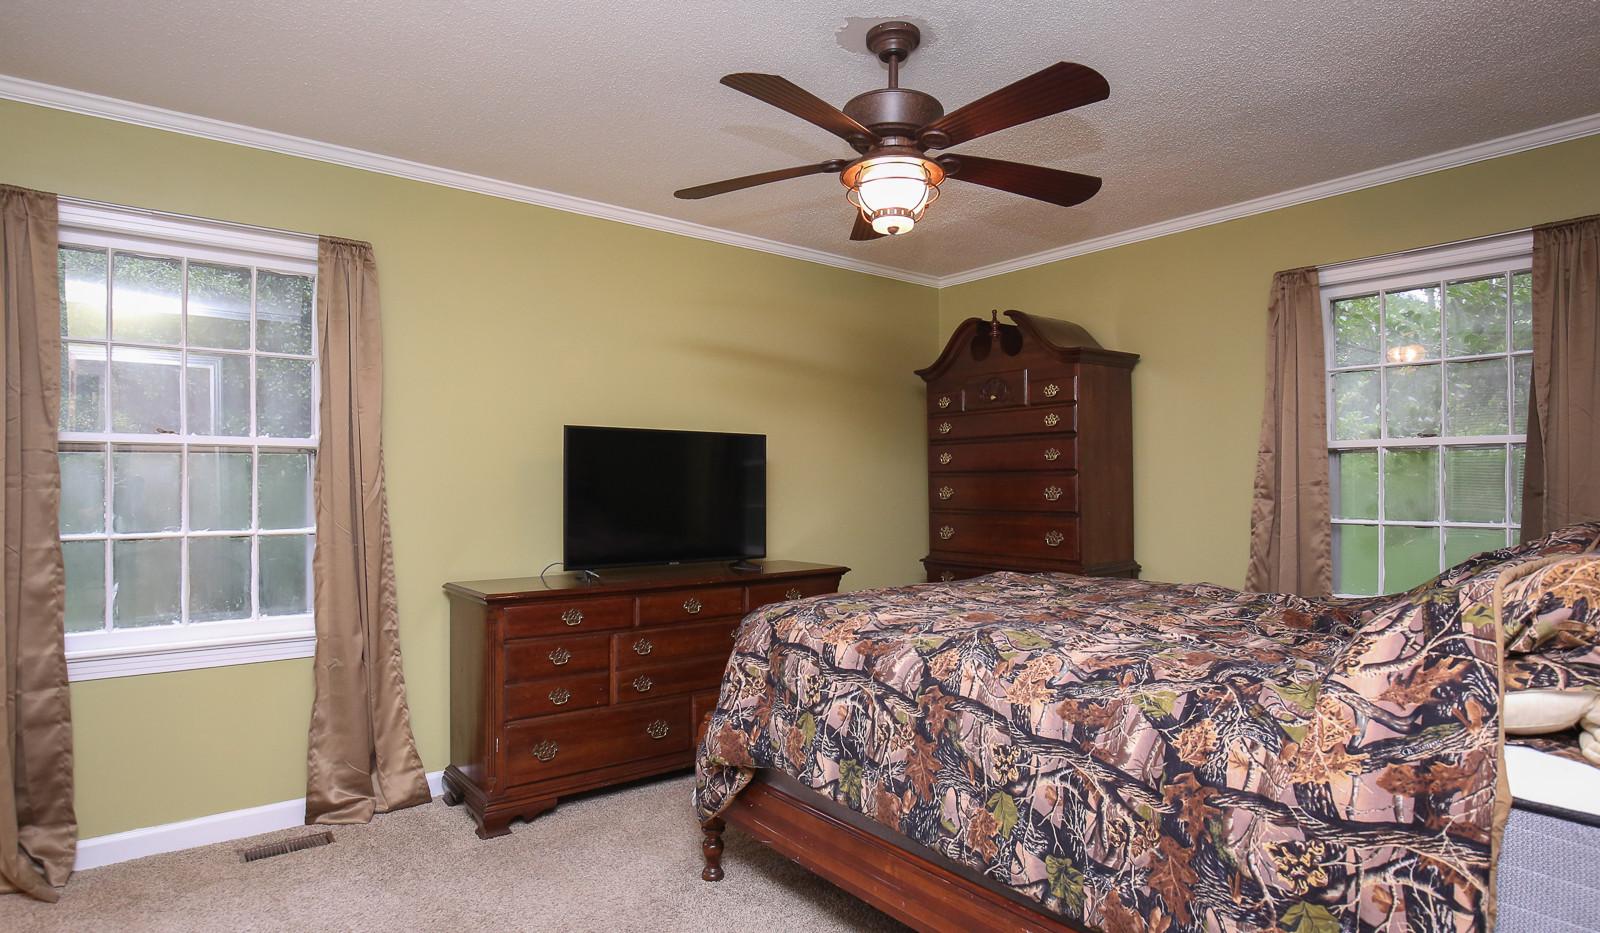 028_294_barnes_ave_bedroom3.jpg